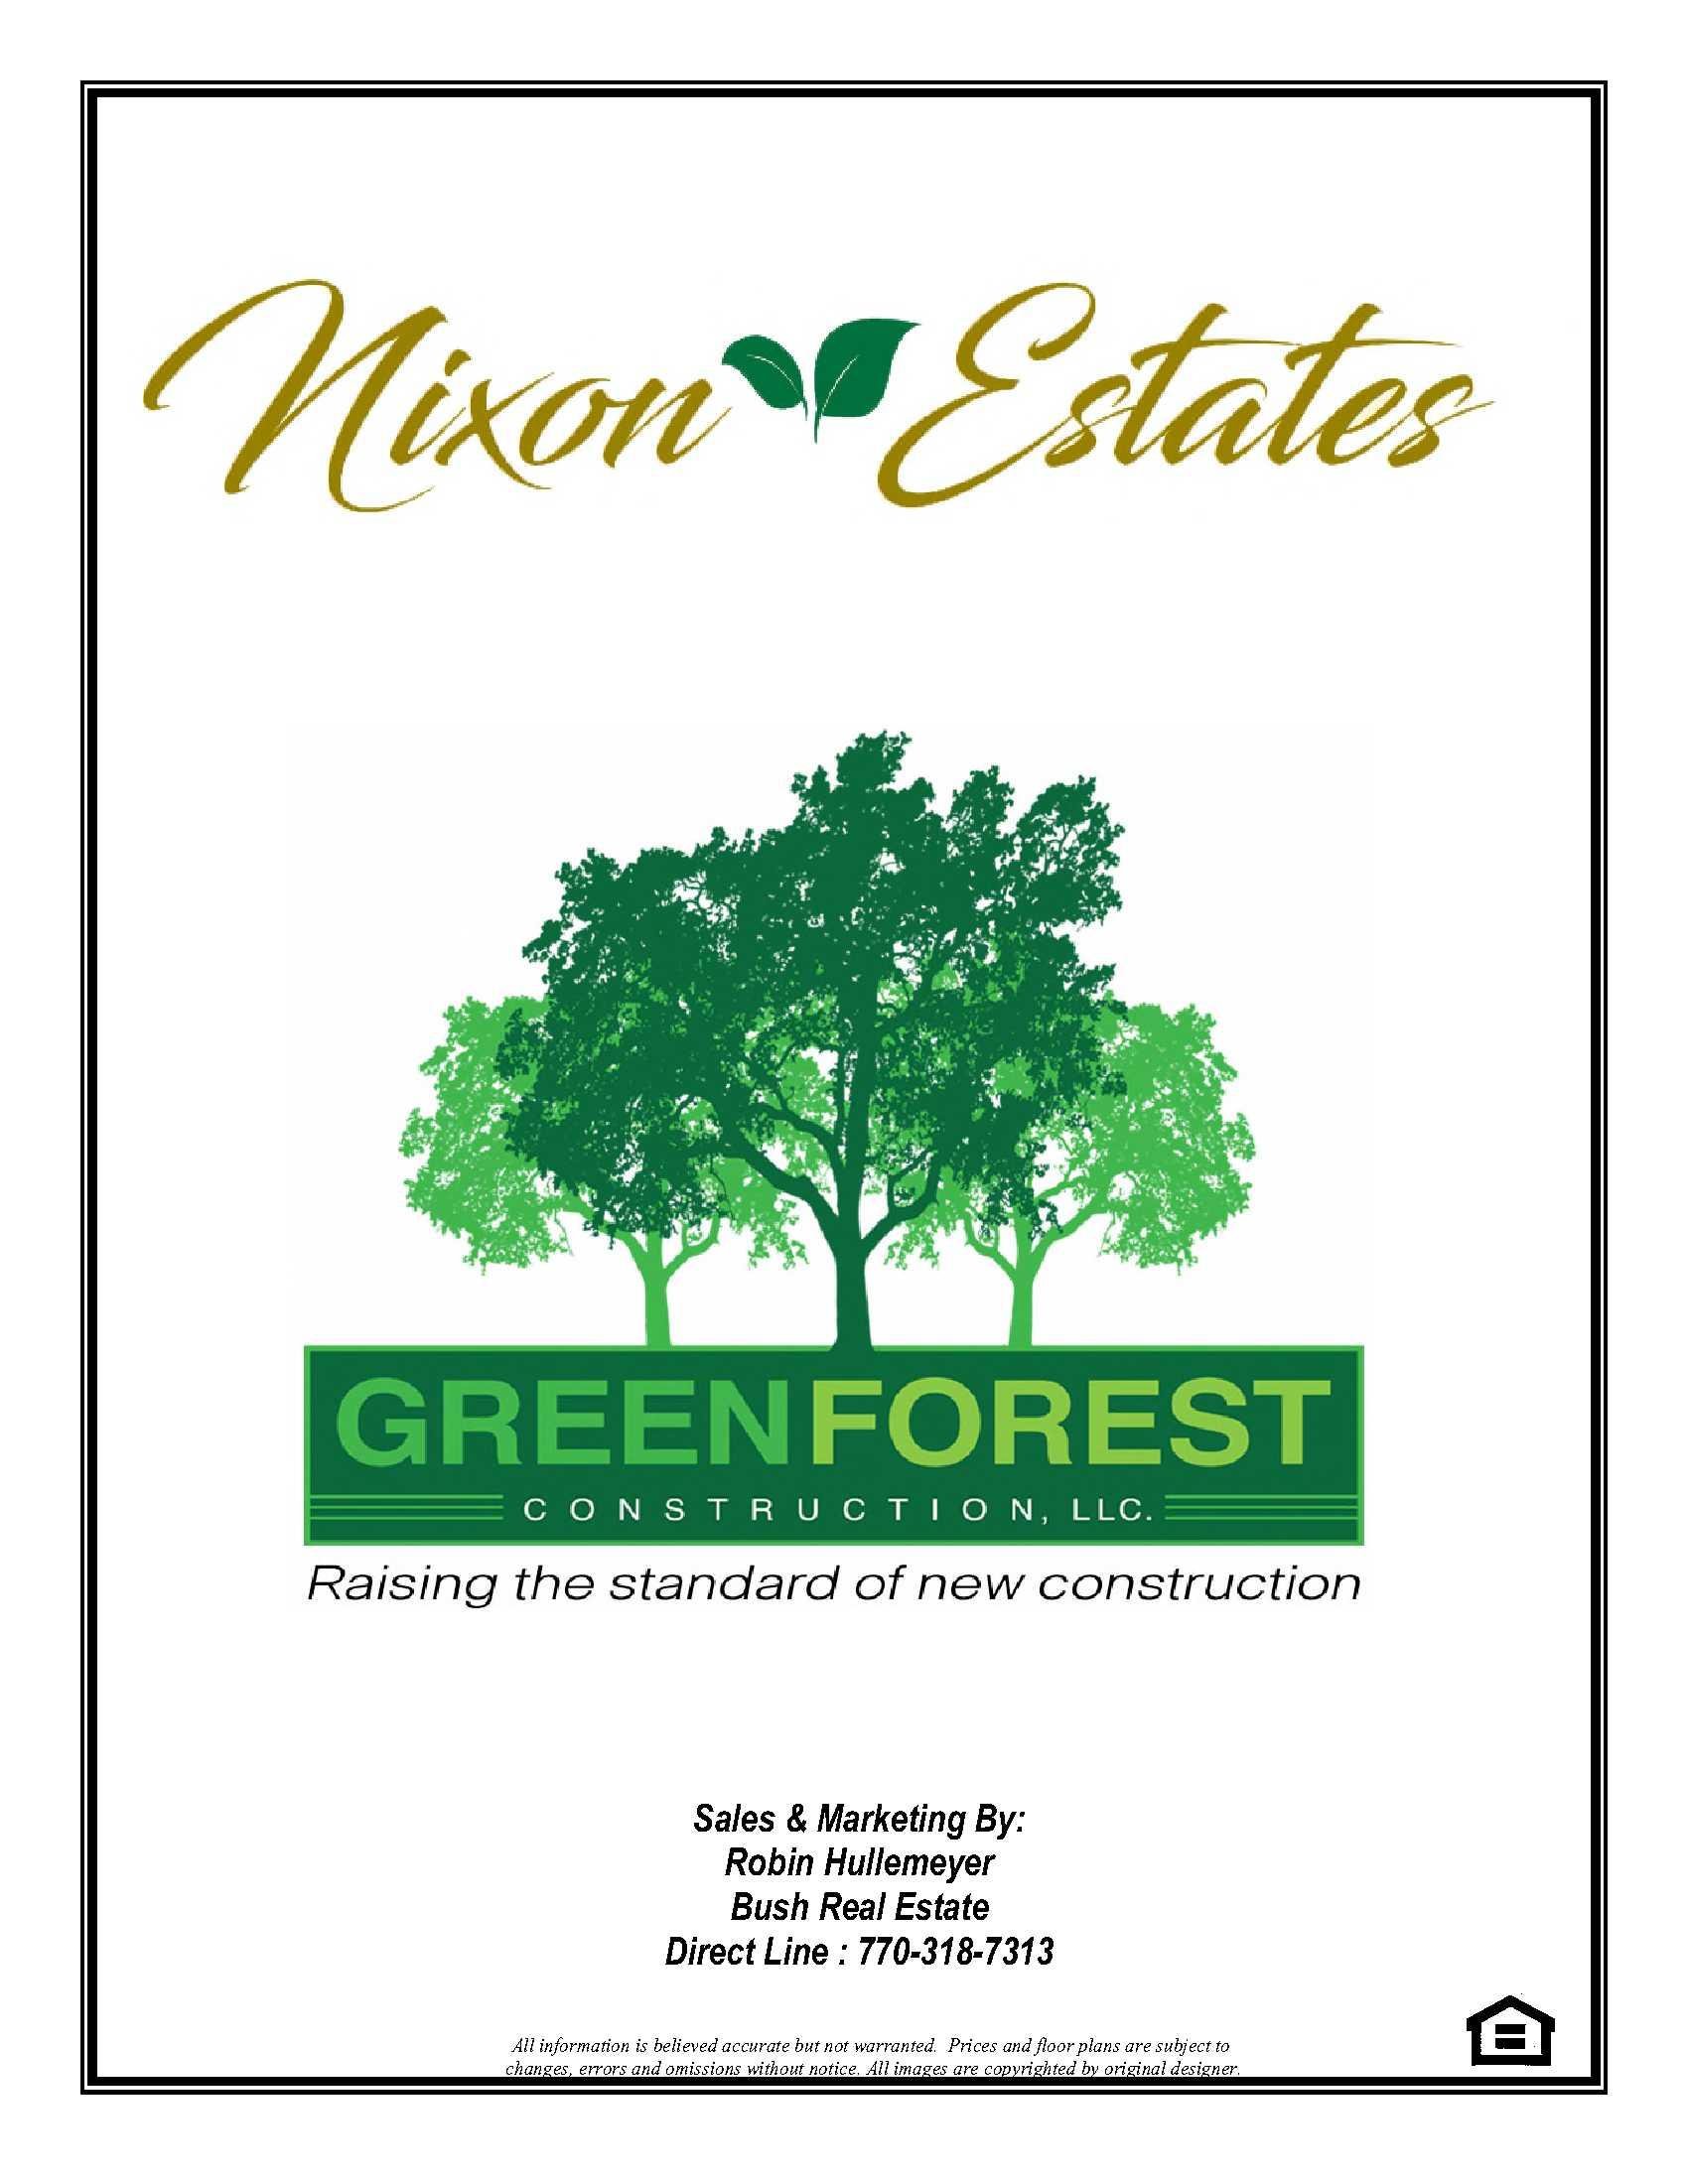 03.13.17 - Nixon Estates Full Package_1.jpg